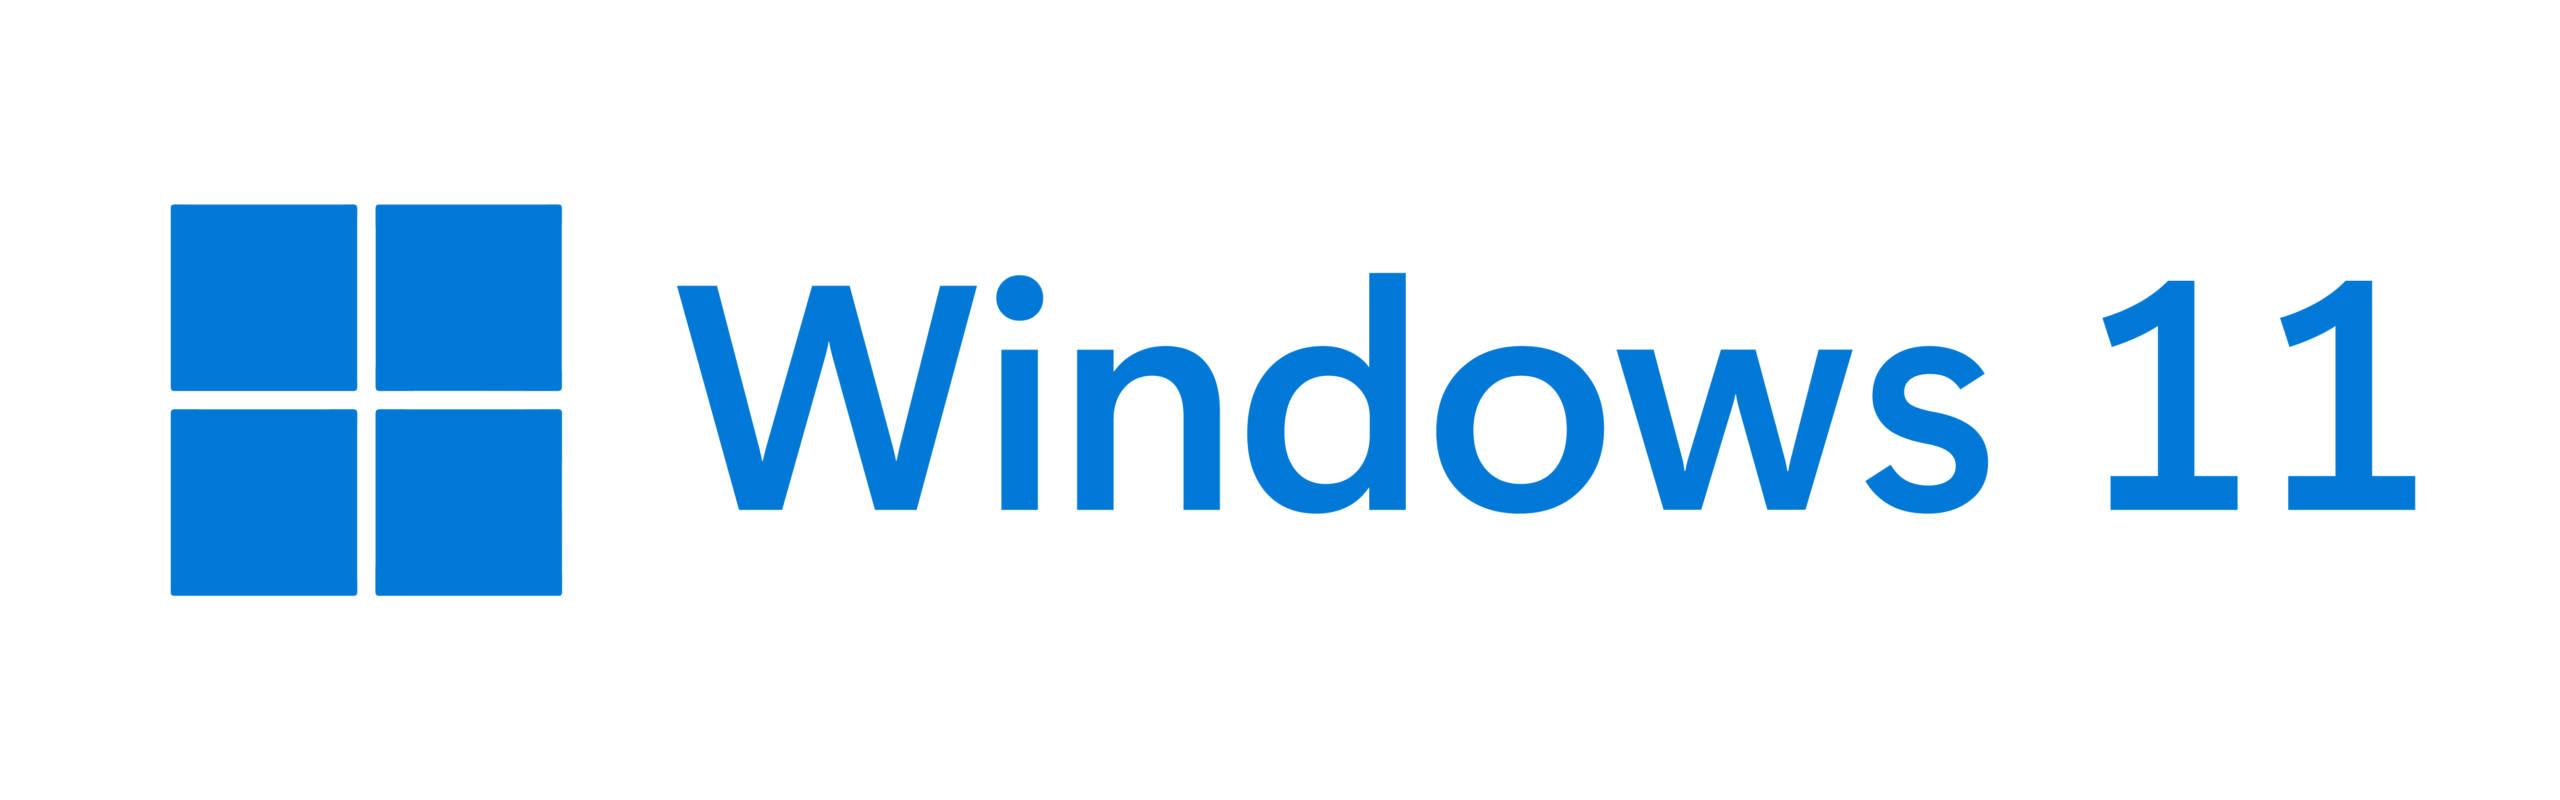 Logotipo de Windows 11